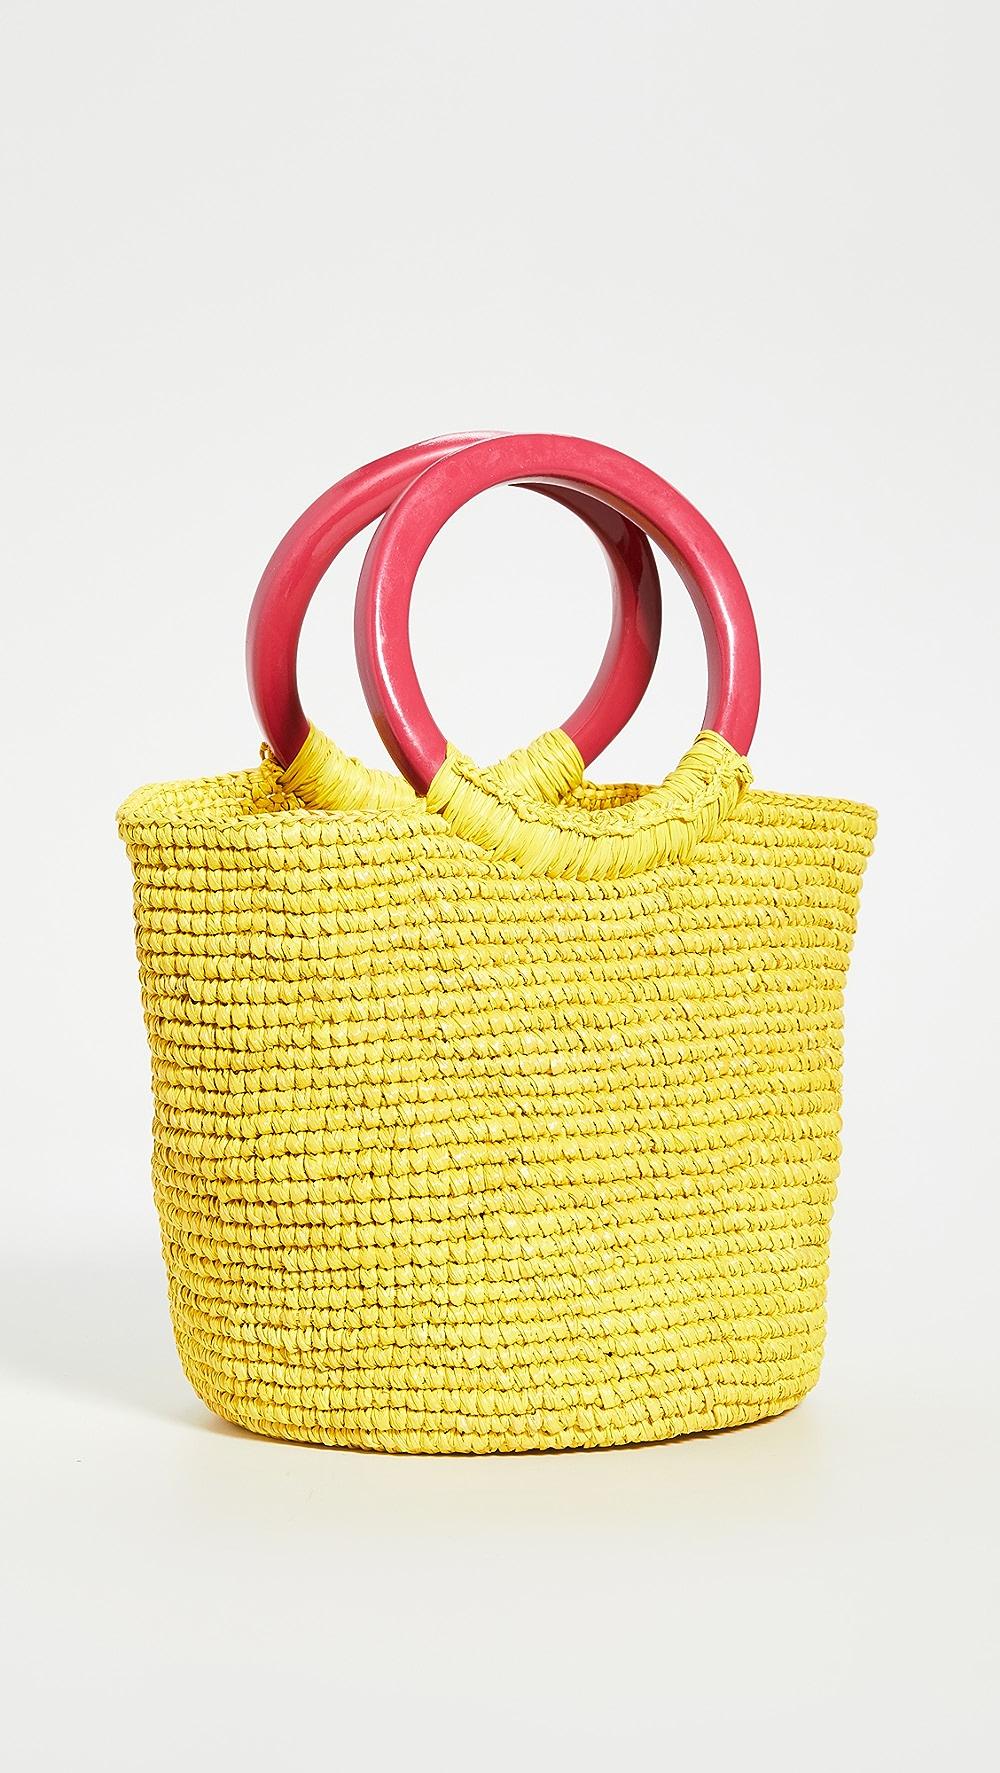 Audacious Sensi Studio - Medium Bucket Bag Discounts Price